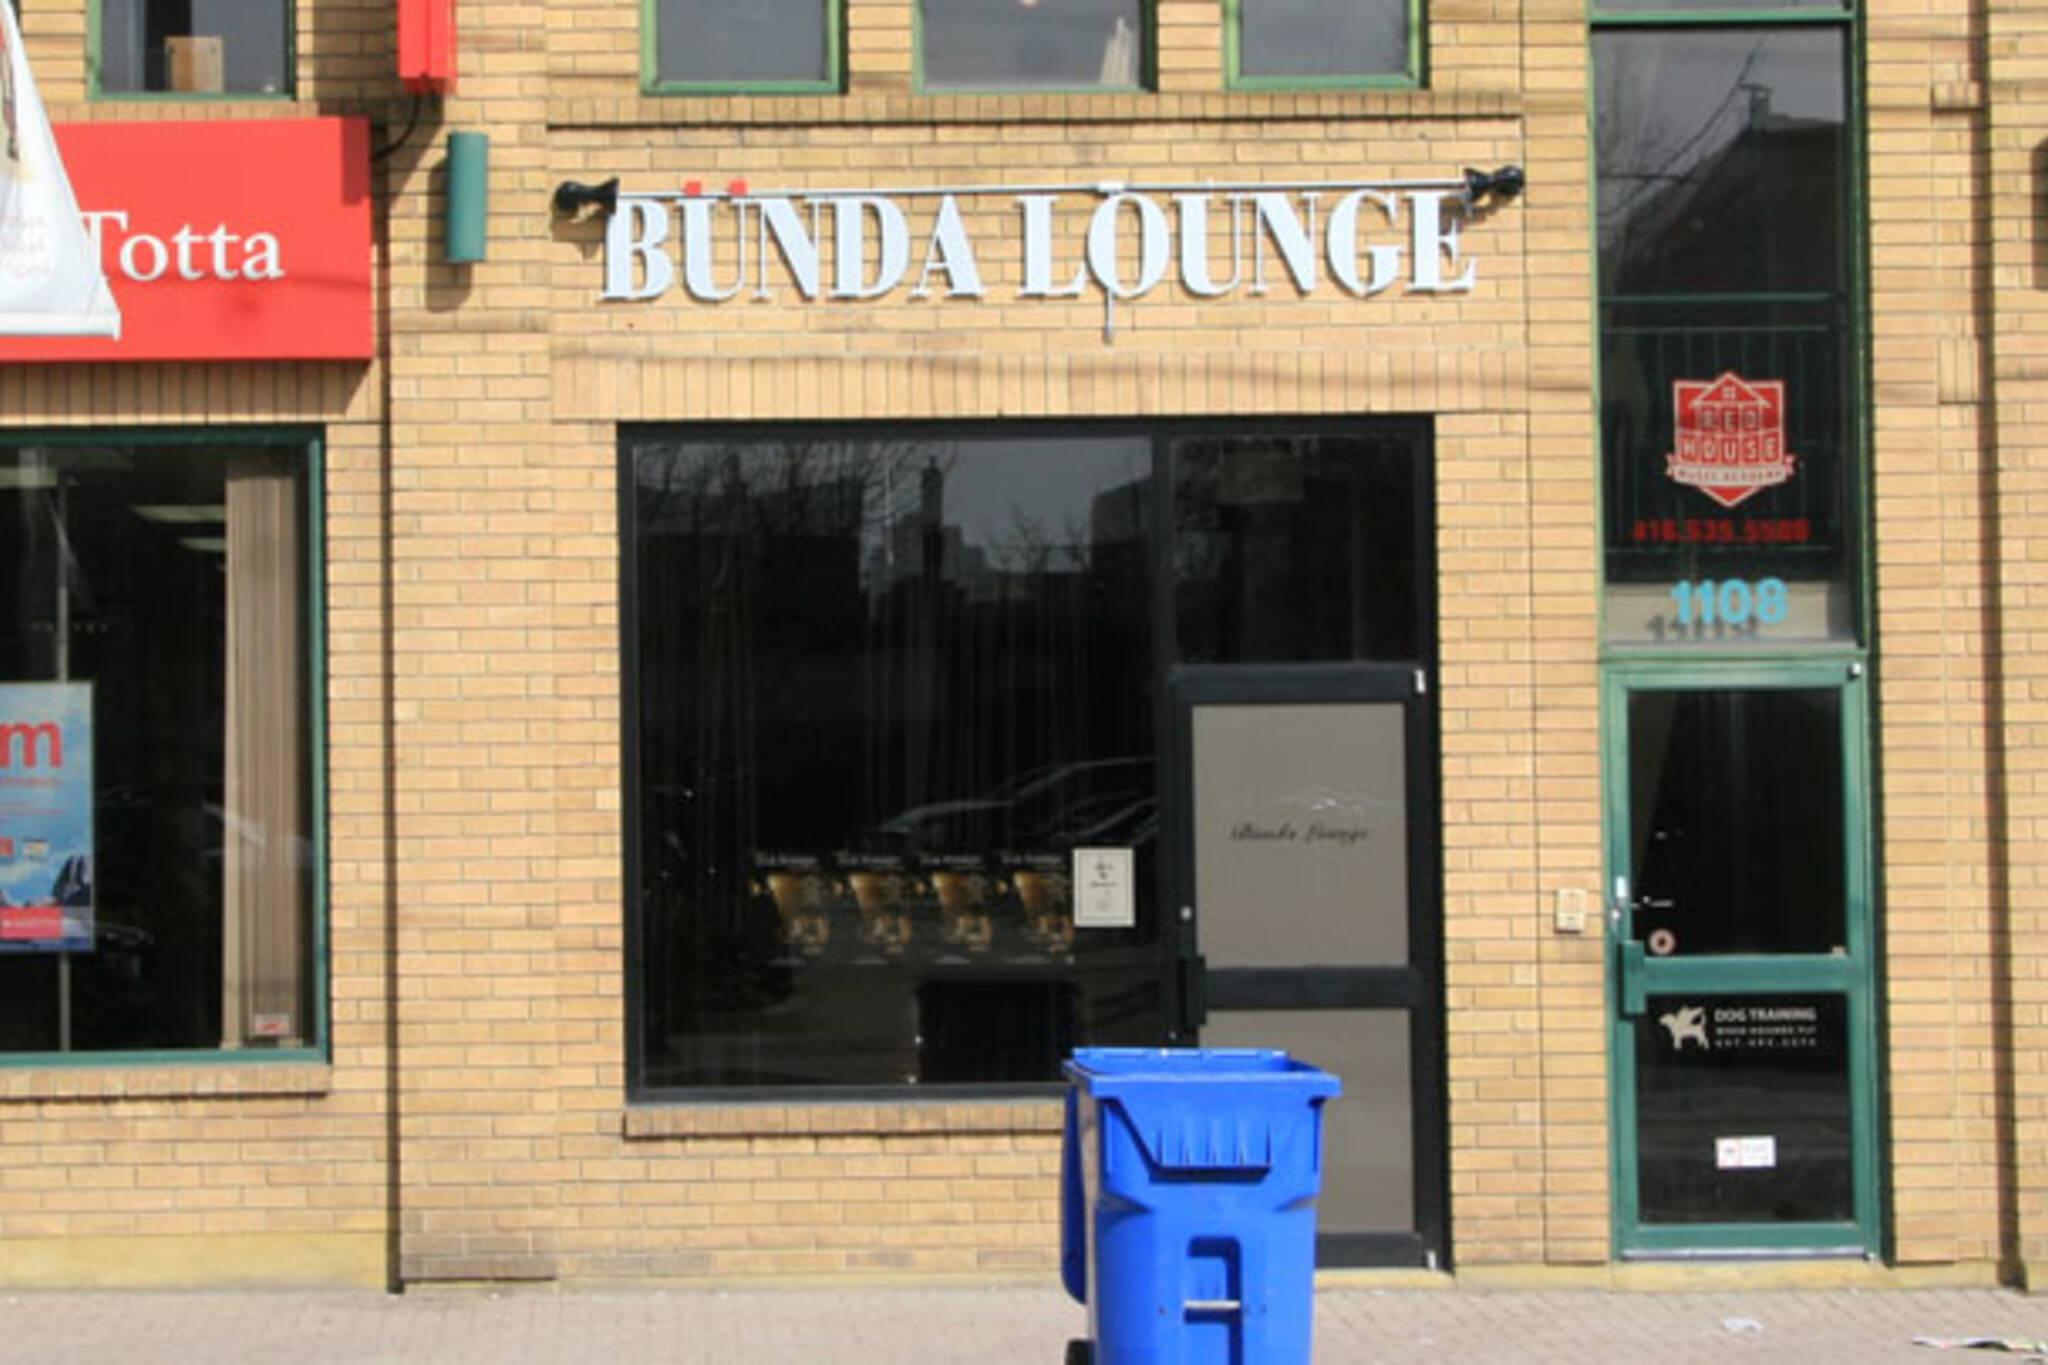 Bunda Lounge Toronto